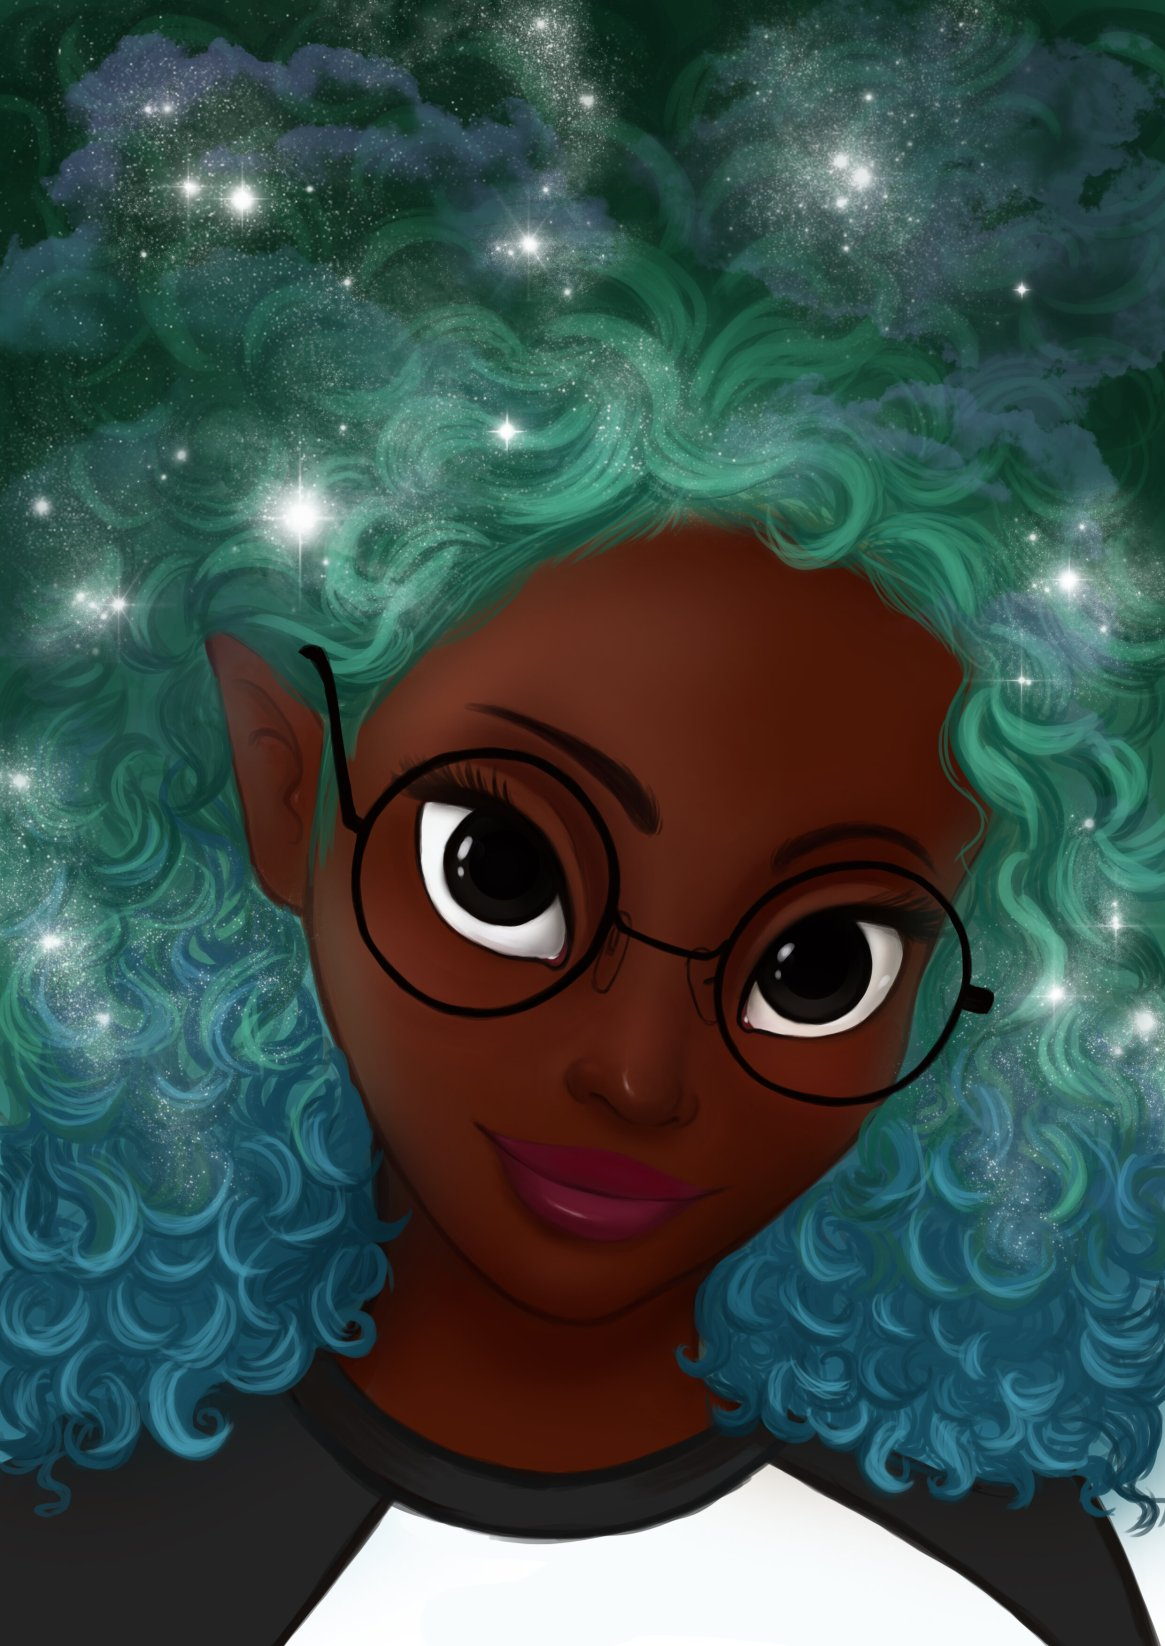 Artistic rendering of Ako, courtesy of Marci & Ako.